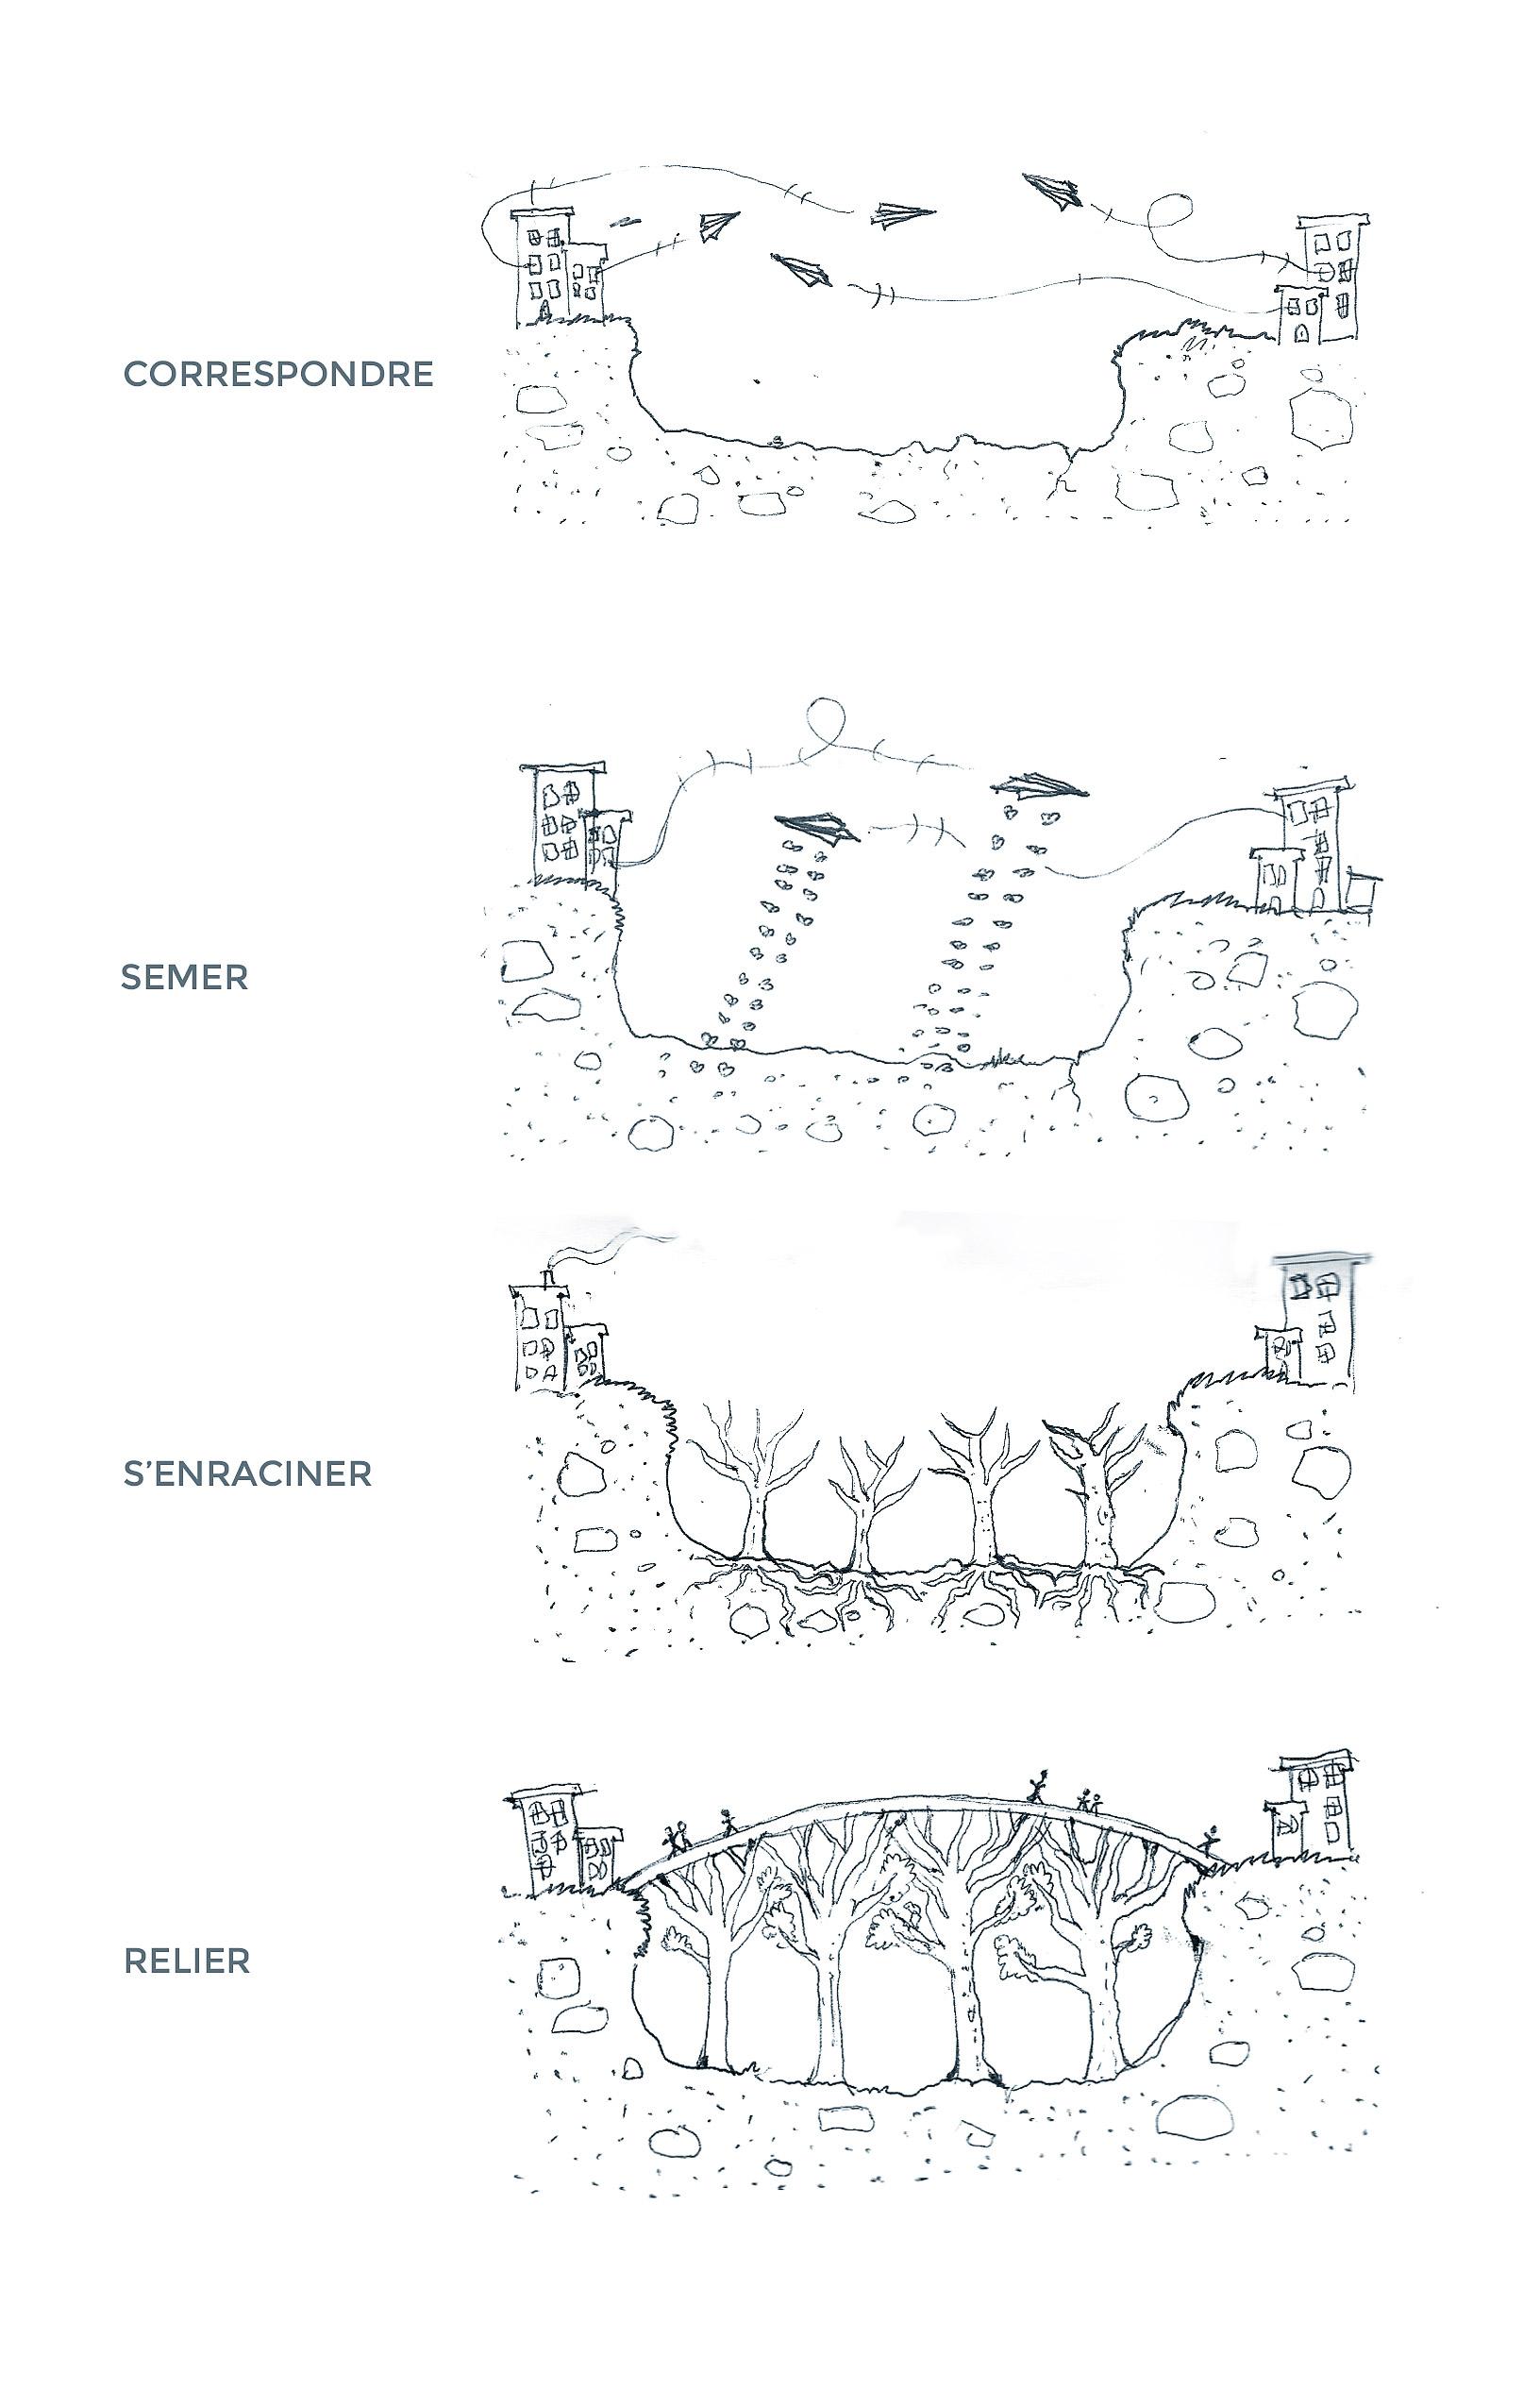 art public, complexe environnemental, saint-michel, montreal 375, collectif escargo, karyna st-pierre, pierre-yves diehl